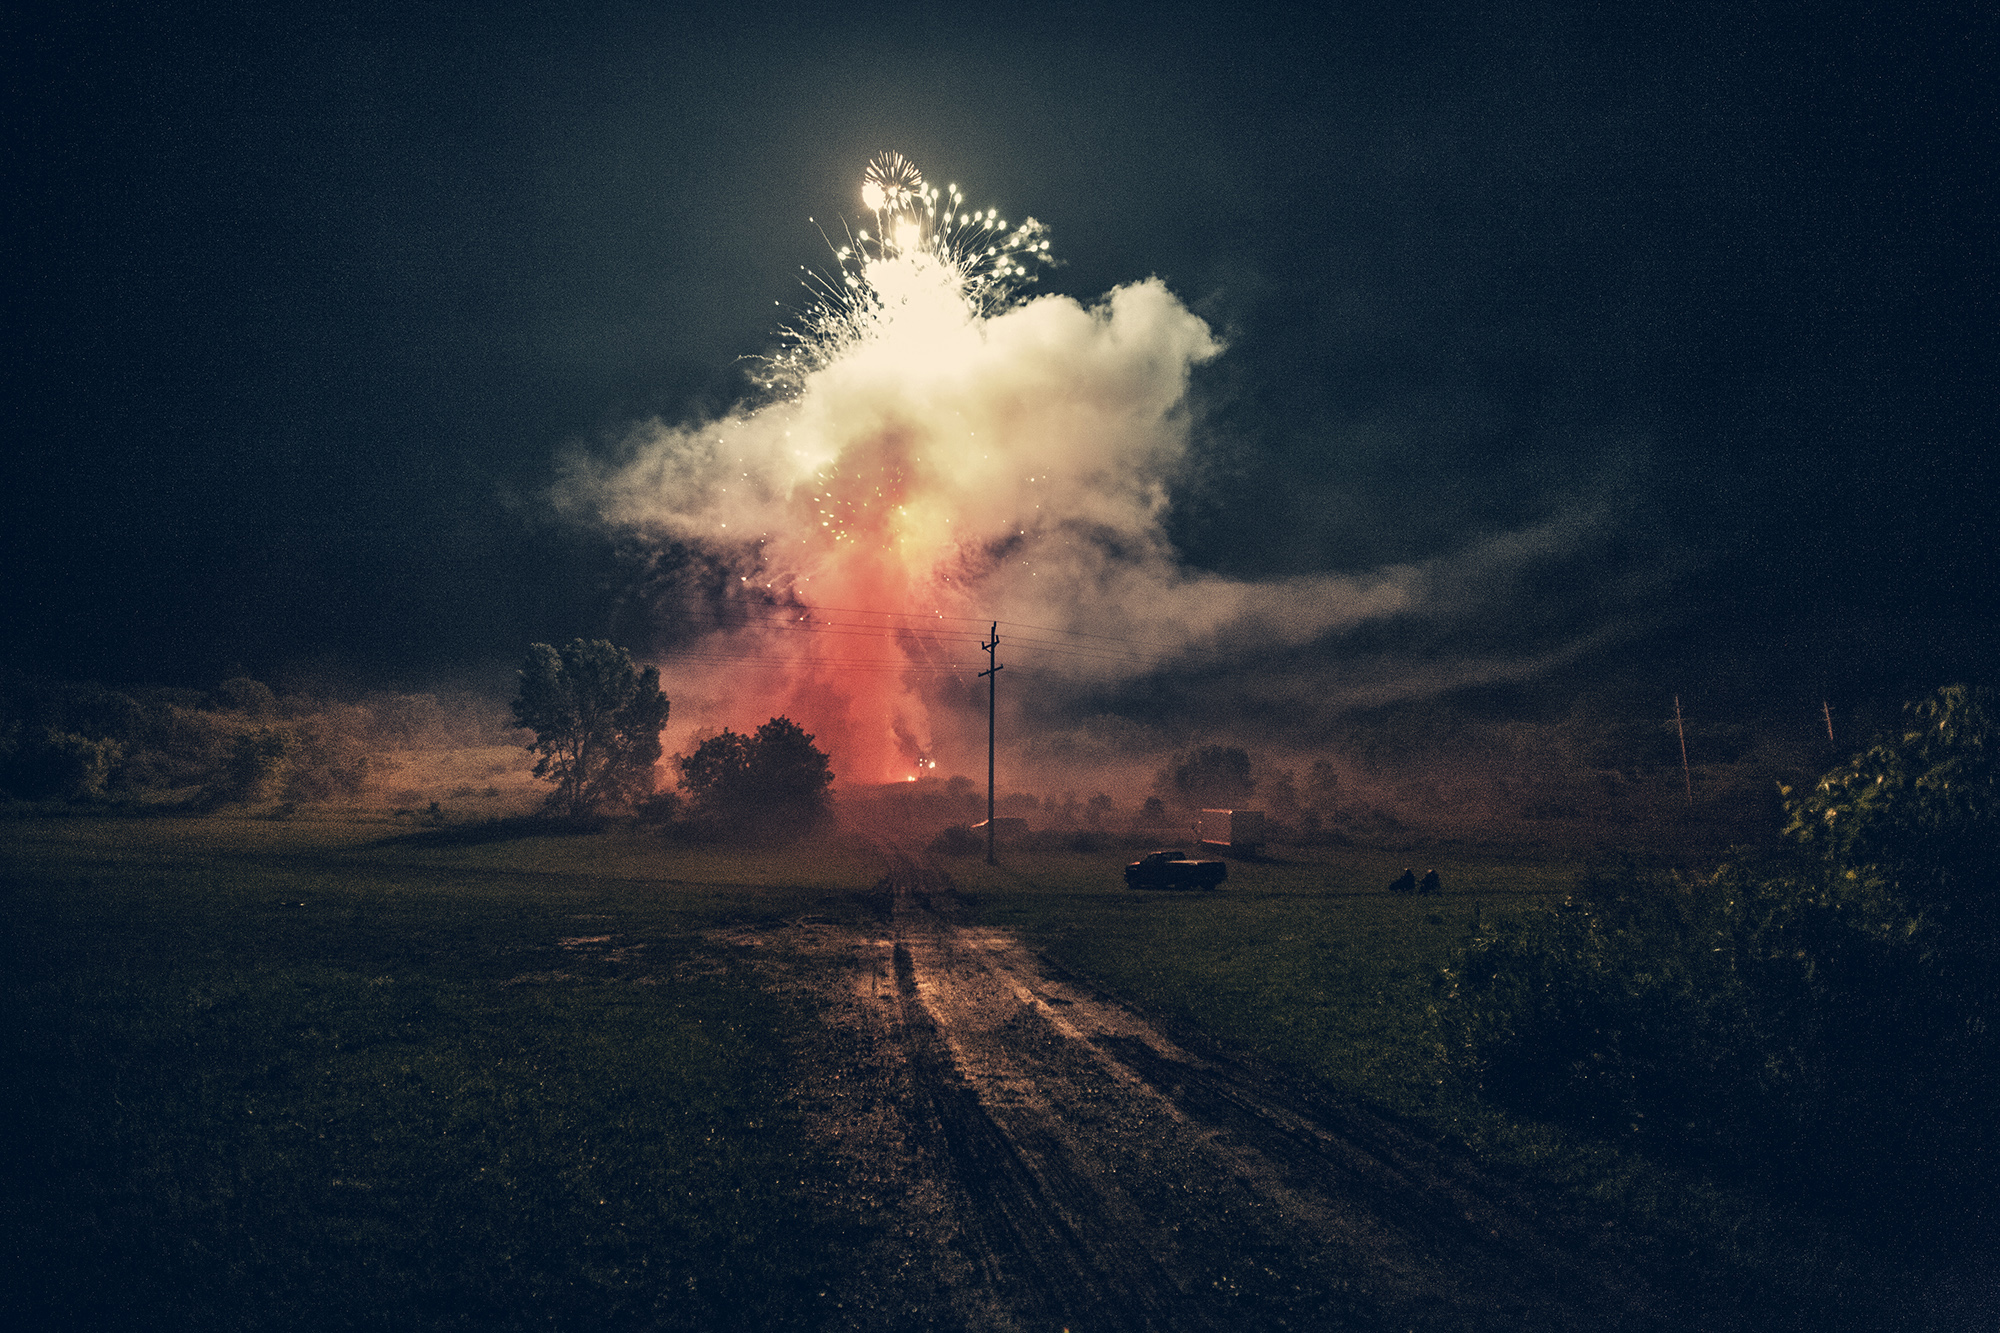 FranciscoMunoz_Explosion.jpg